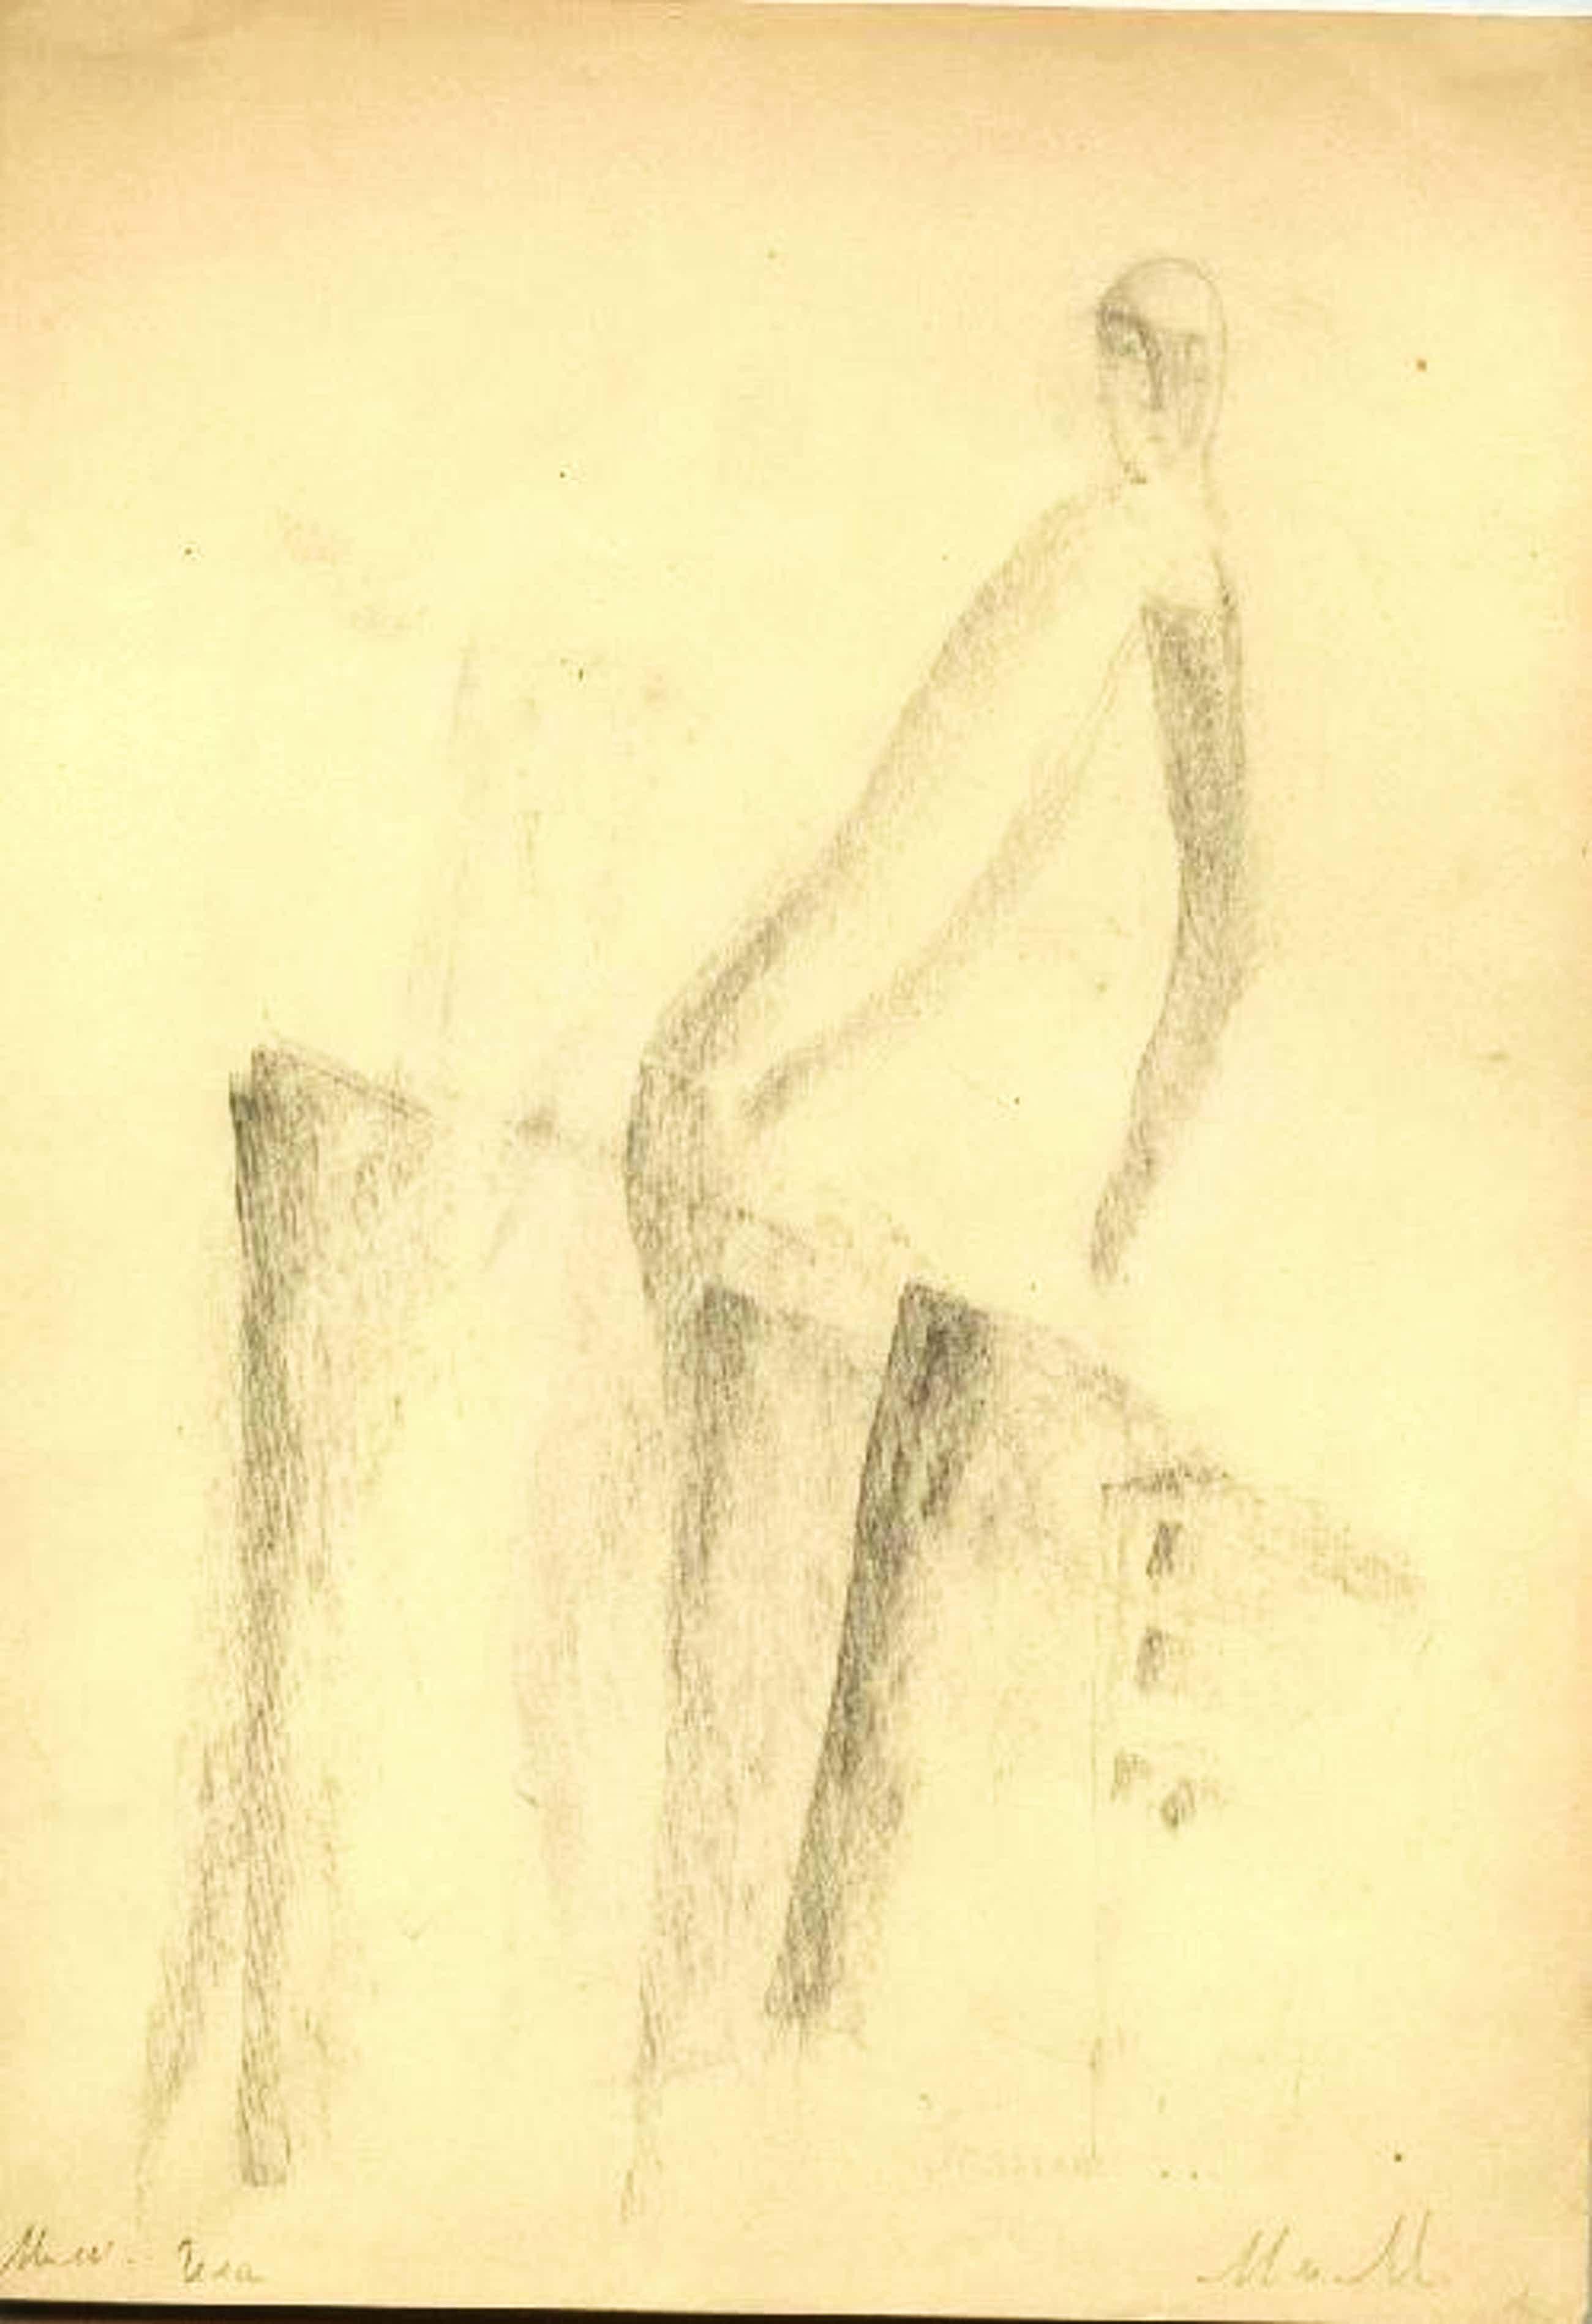 A. Korsakowa - Vier Zeichnungen A. K. monogr. Korsakowa Alexandra Nikolajewna kopen? Bied vanaf 1500!